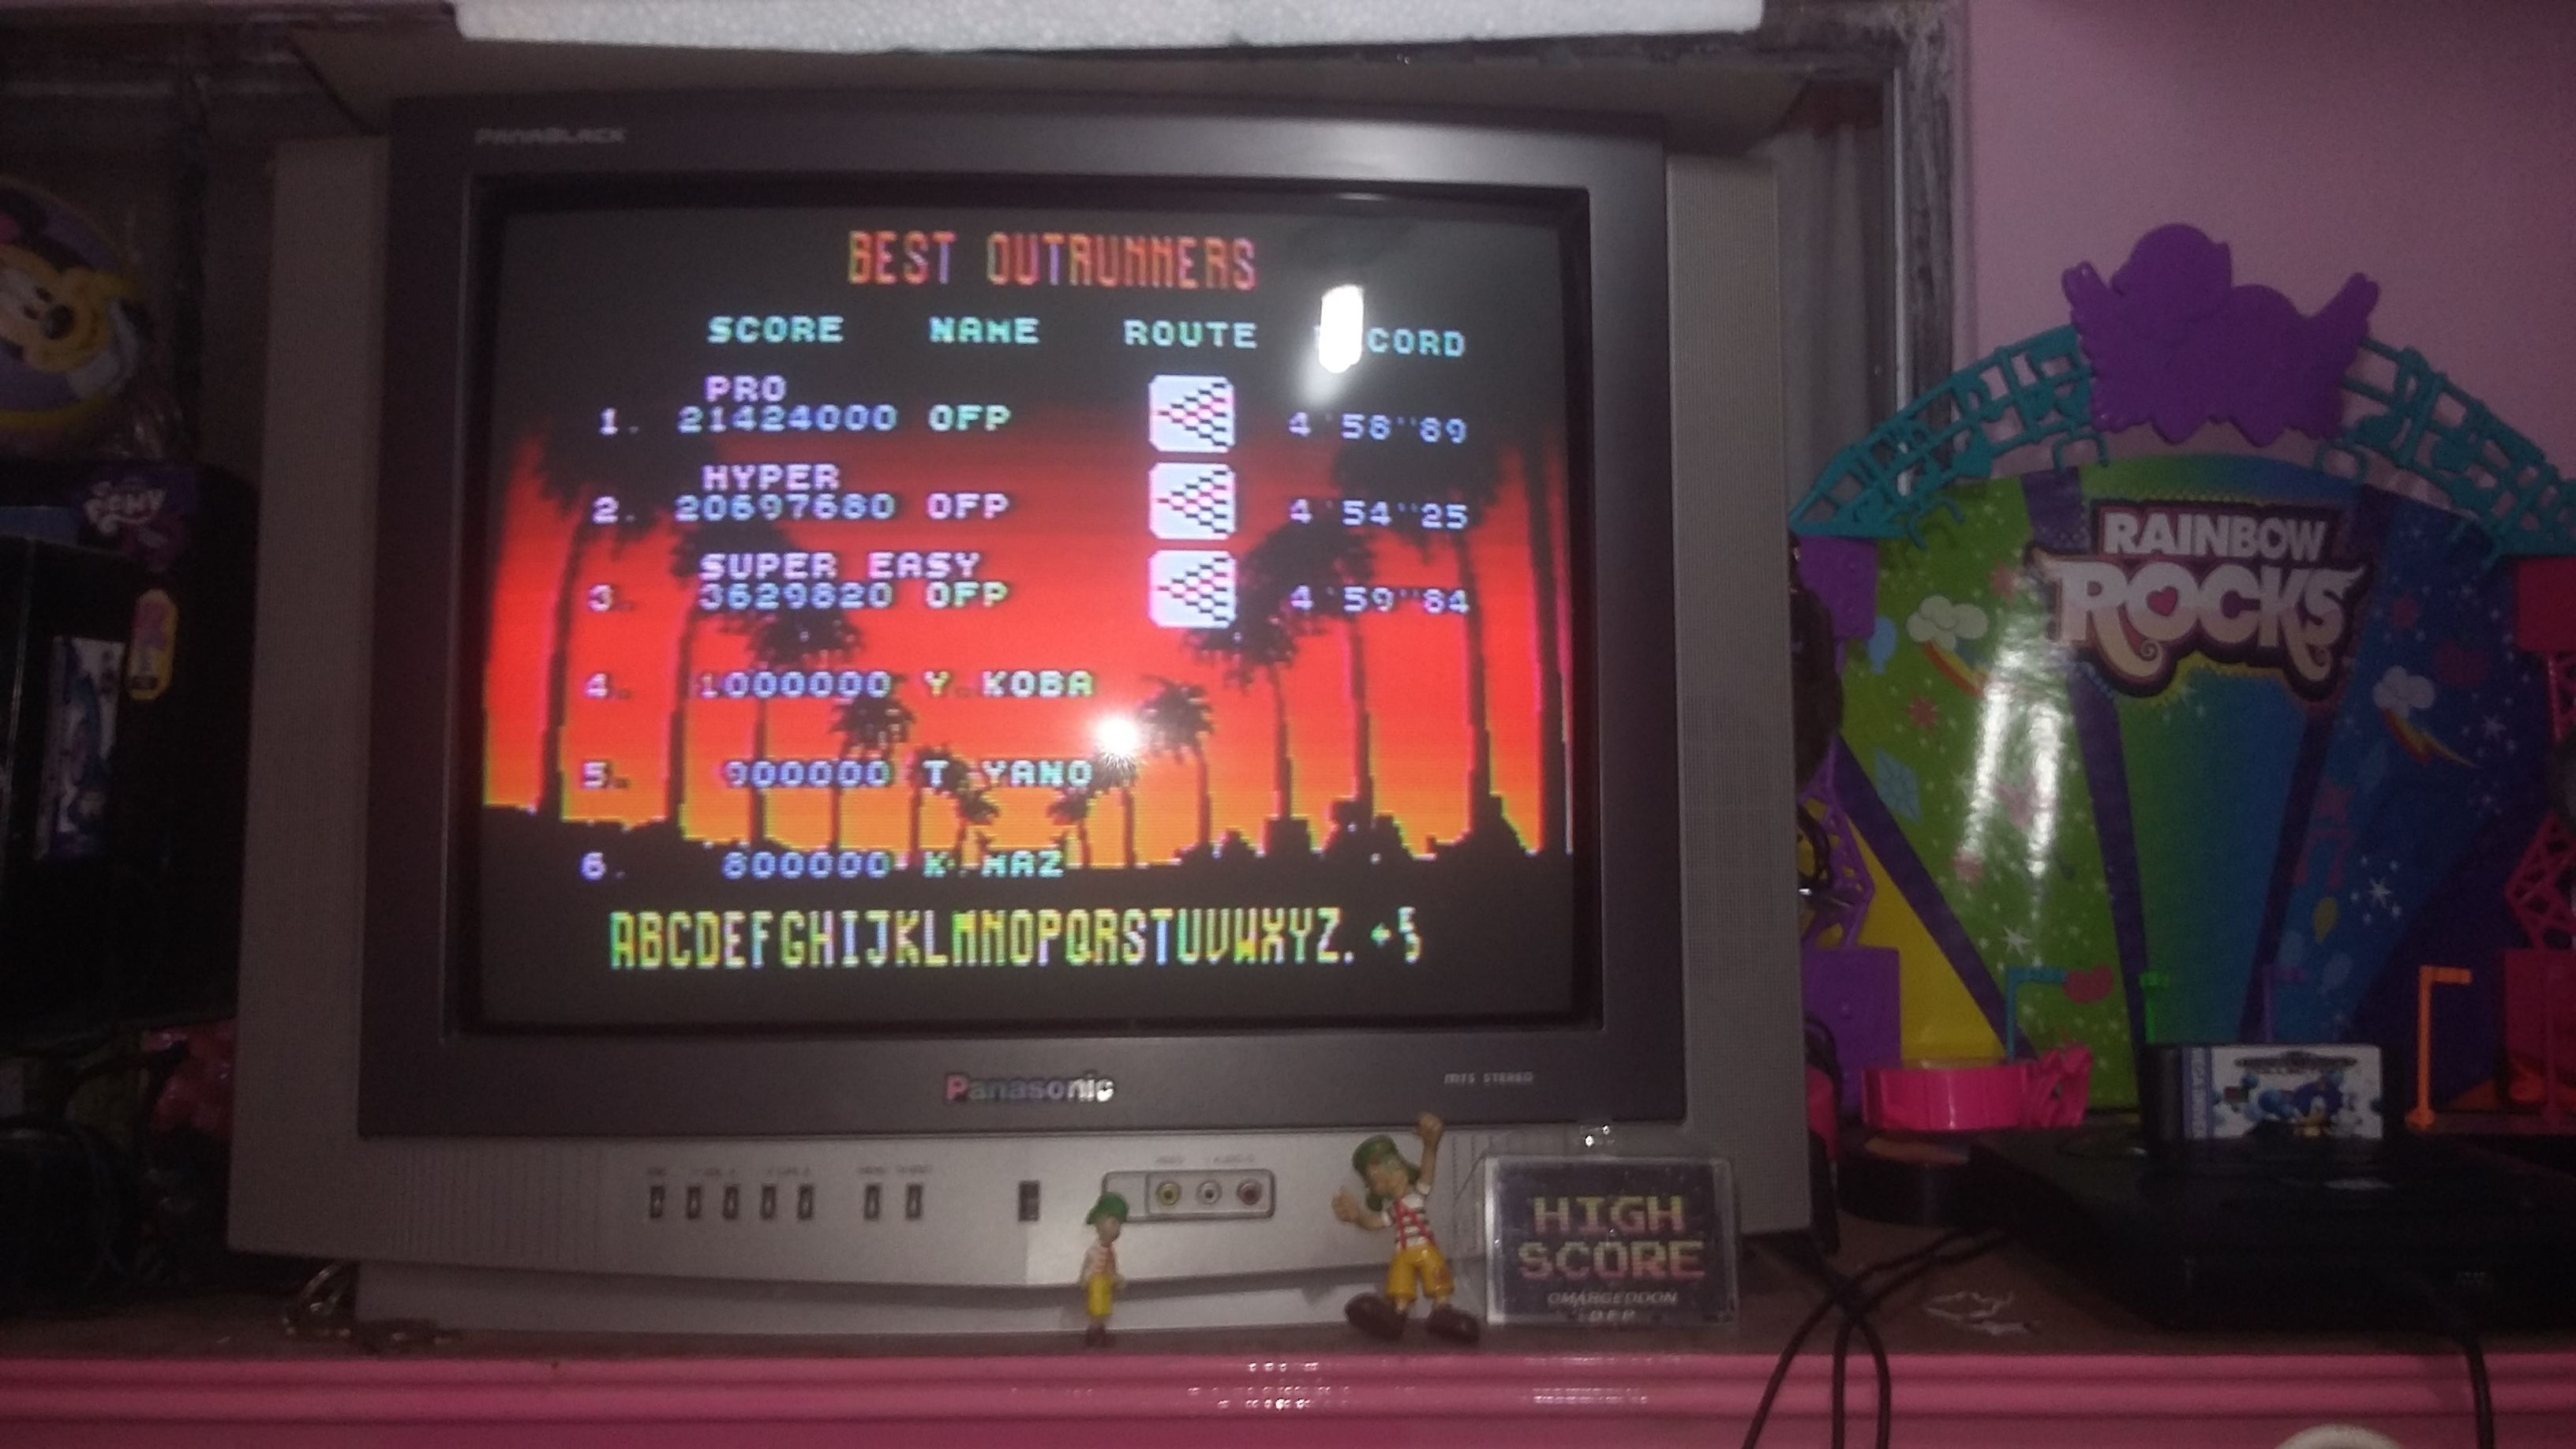 omargeddon: Outrun [Hyper] (Sega Genesis / MegaDrive) 20,697,680 points on 2018-08-15 23:33:33